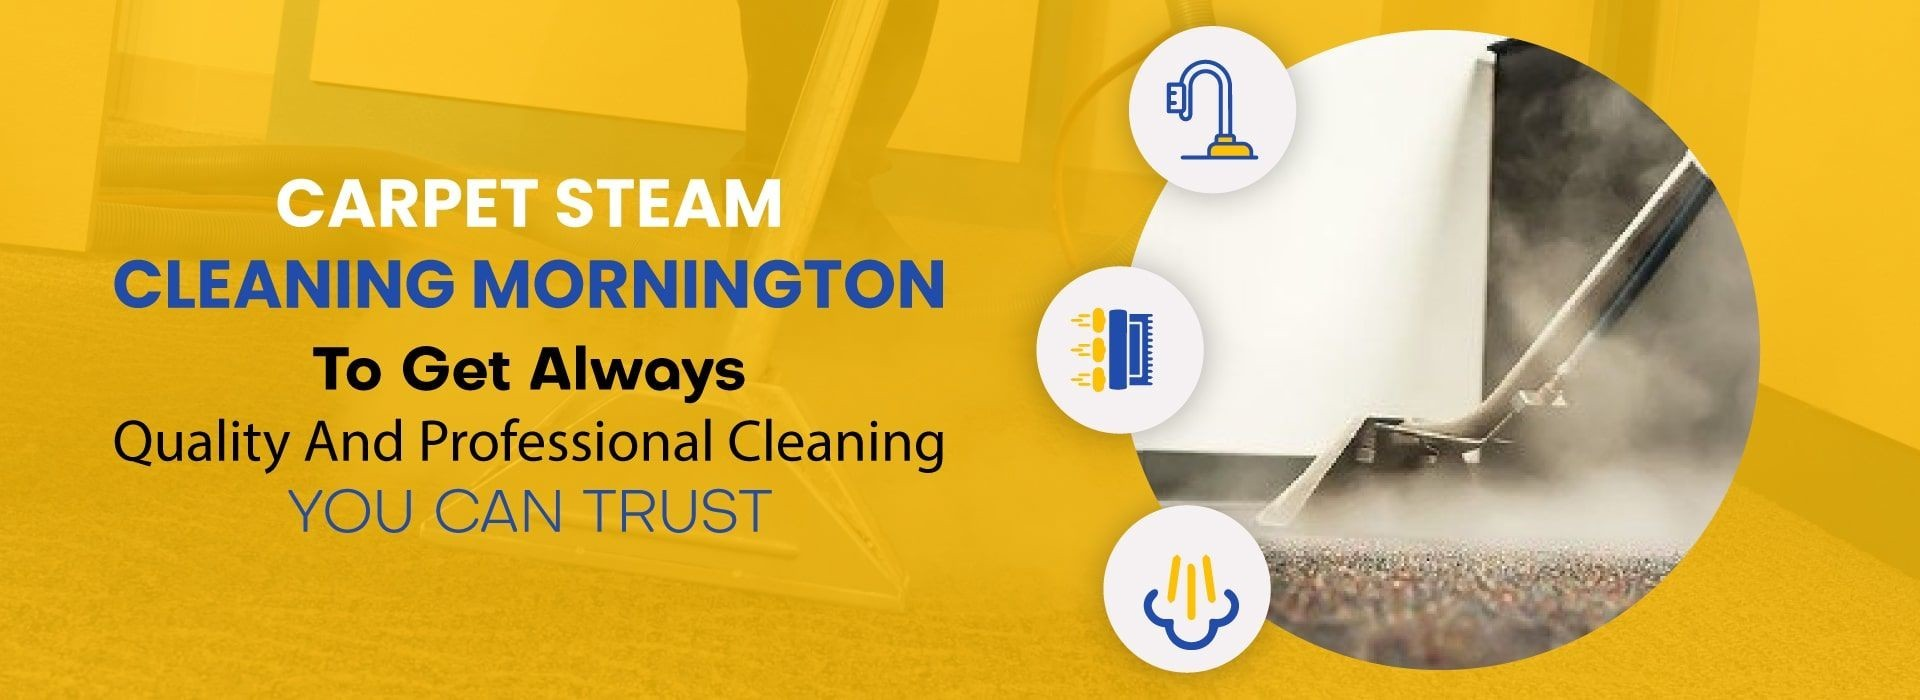 Carpet Steam Cleaning Mornington